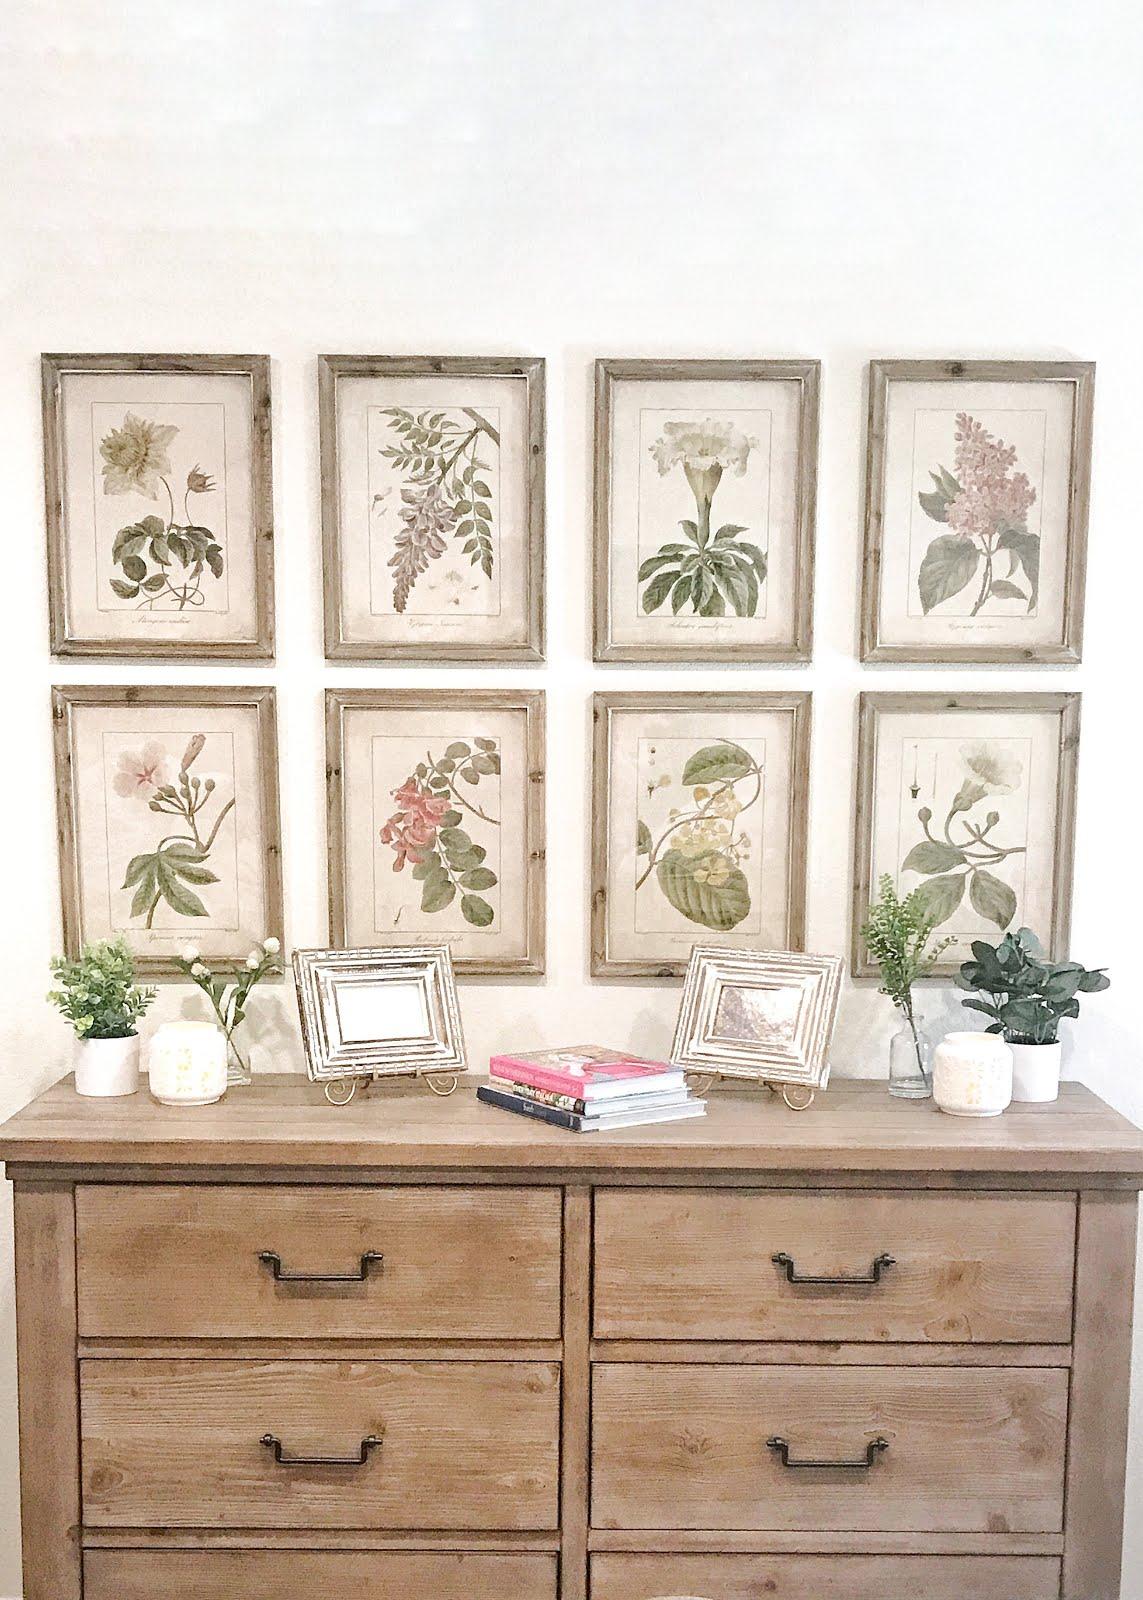 Our Master Bedroom Refresh Using Botanicals